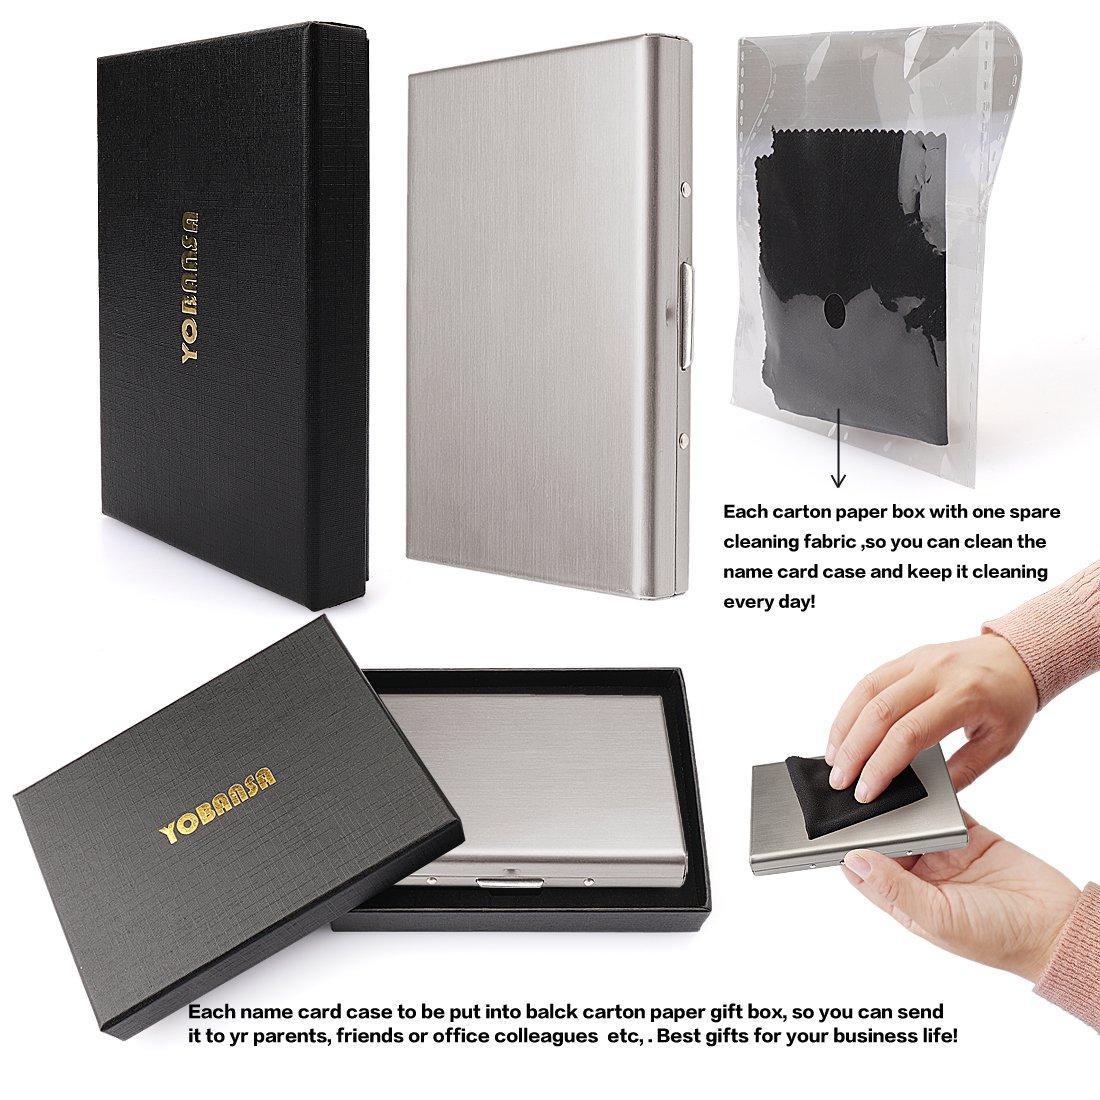 Rose Gold Yobansa/® Stainless Steel Rose Gold Business Card Holder Credit Card Case ID Card Holder Creidt Card Holder for Men and Women